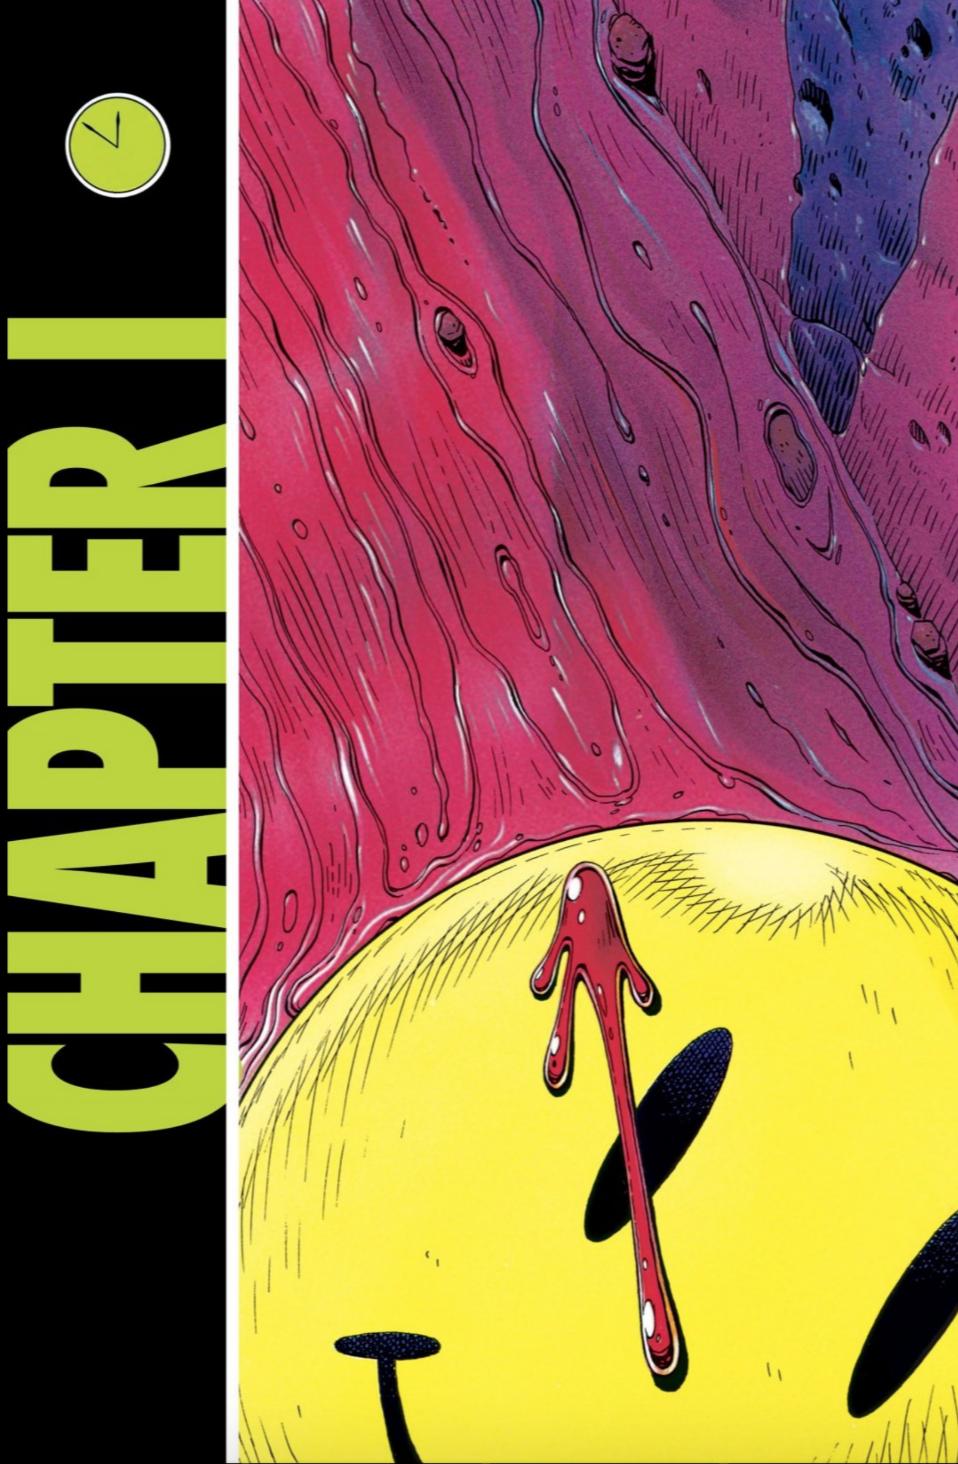 watchmen, deconstructive comics